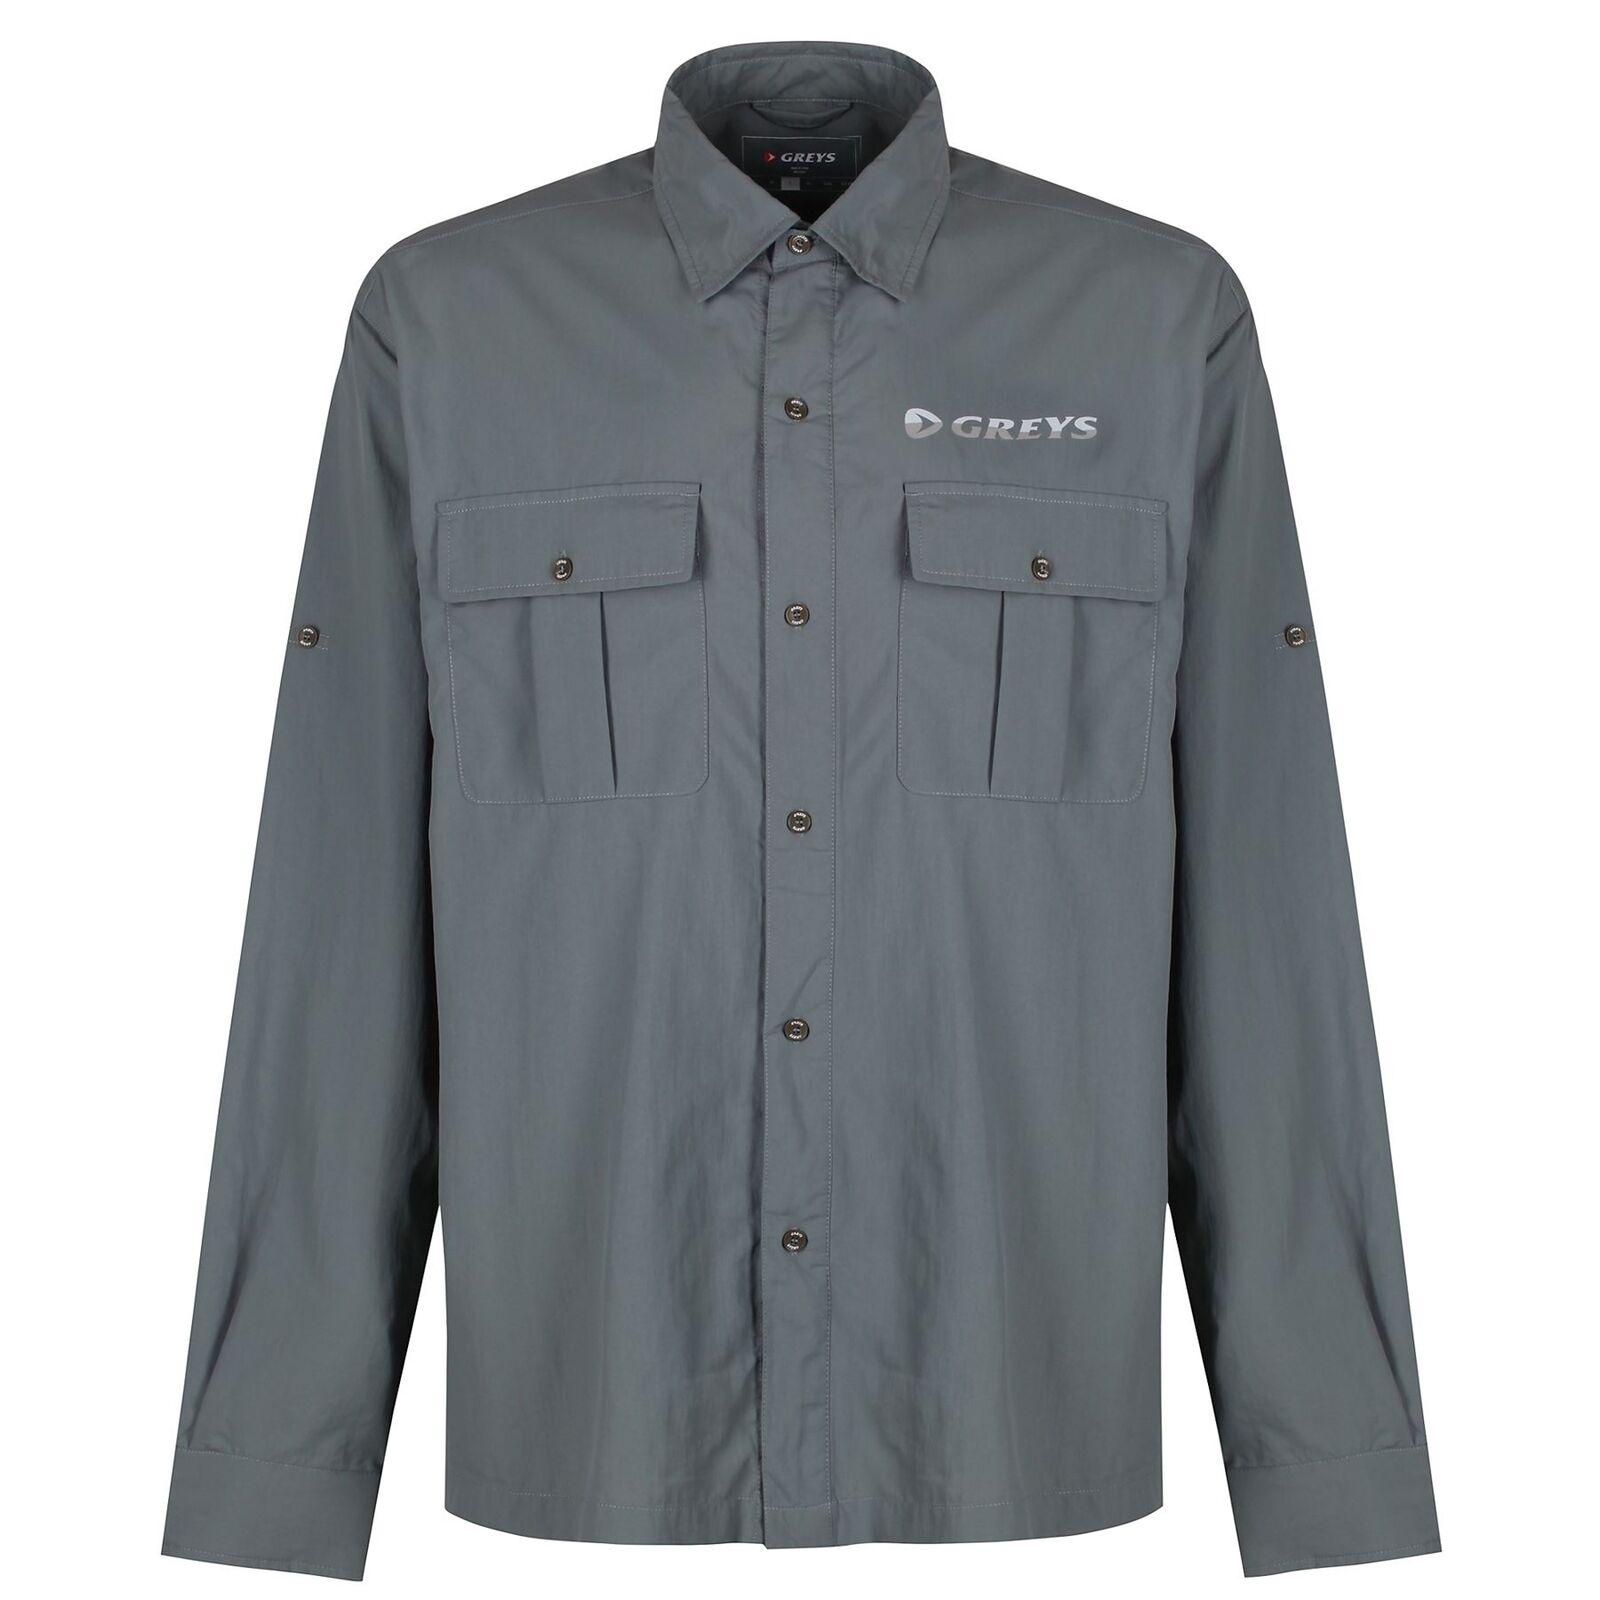 Graus Fishing Shirt / Fishing Clothing